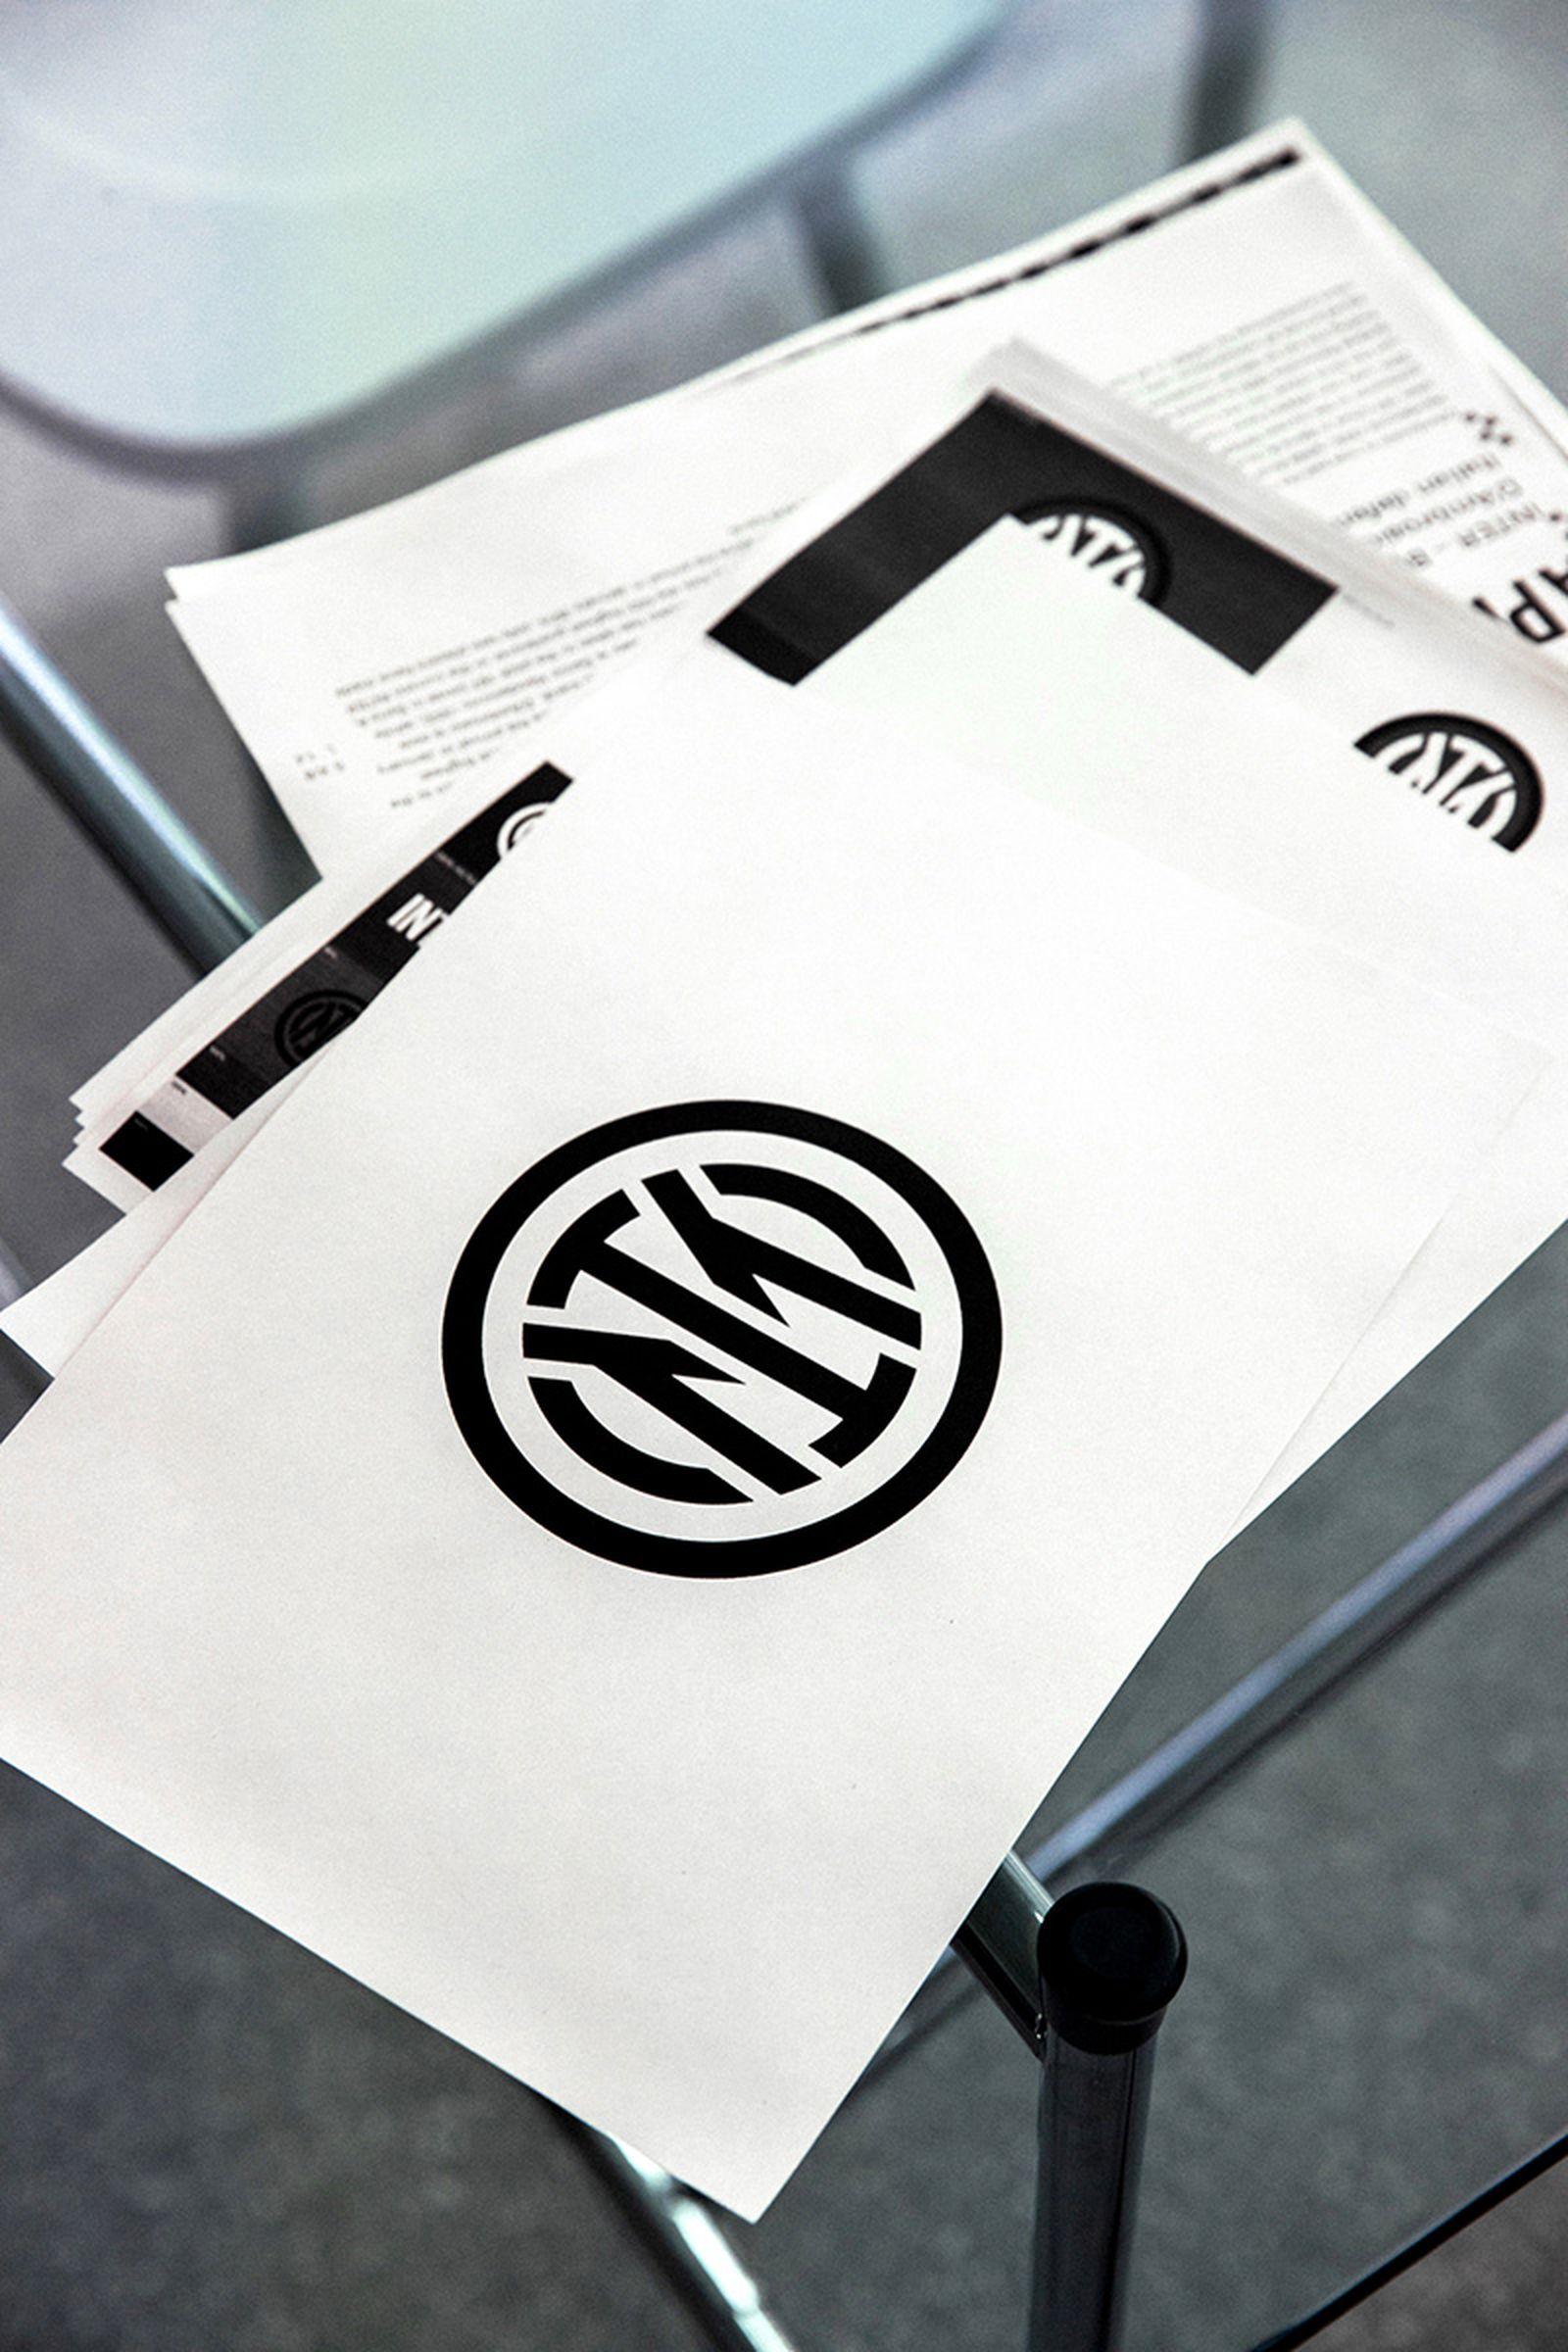 inter-milan-new-logo-bureau-borsche-06